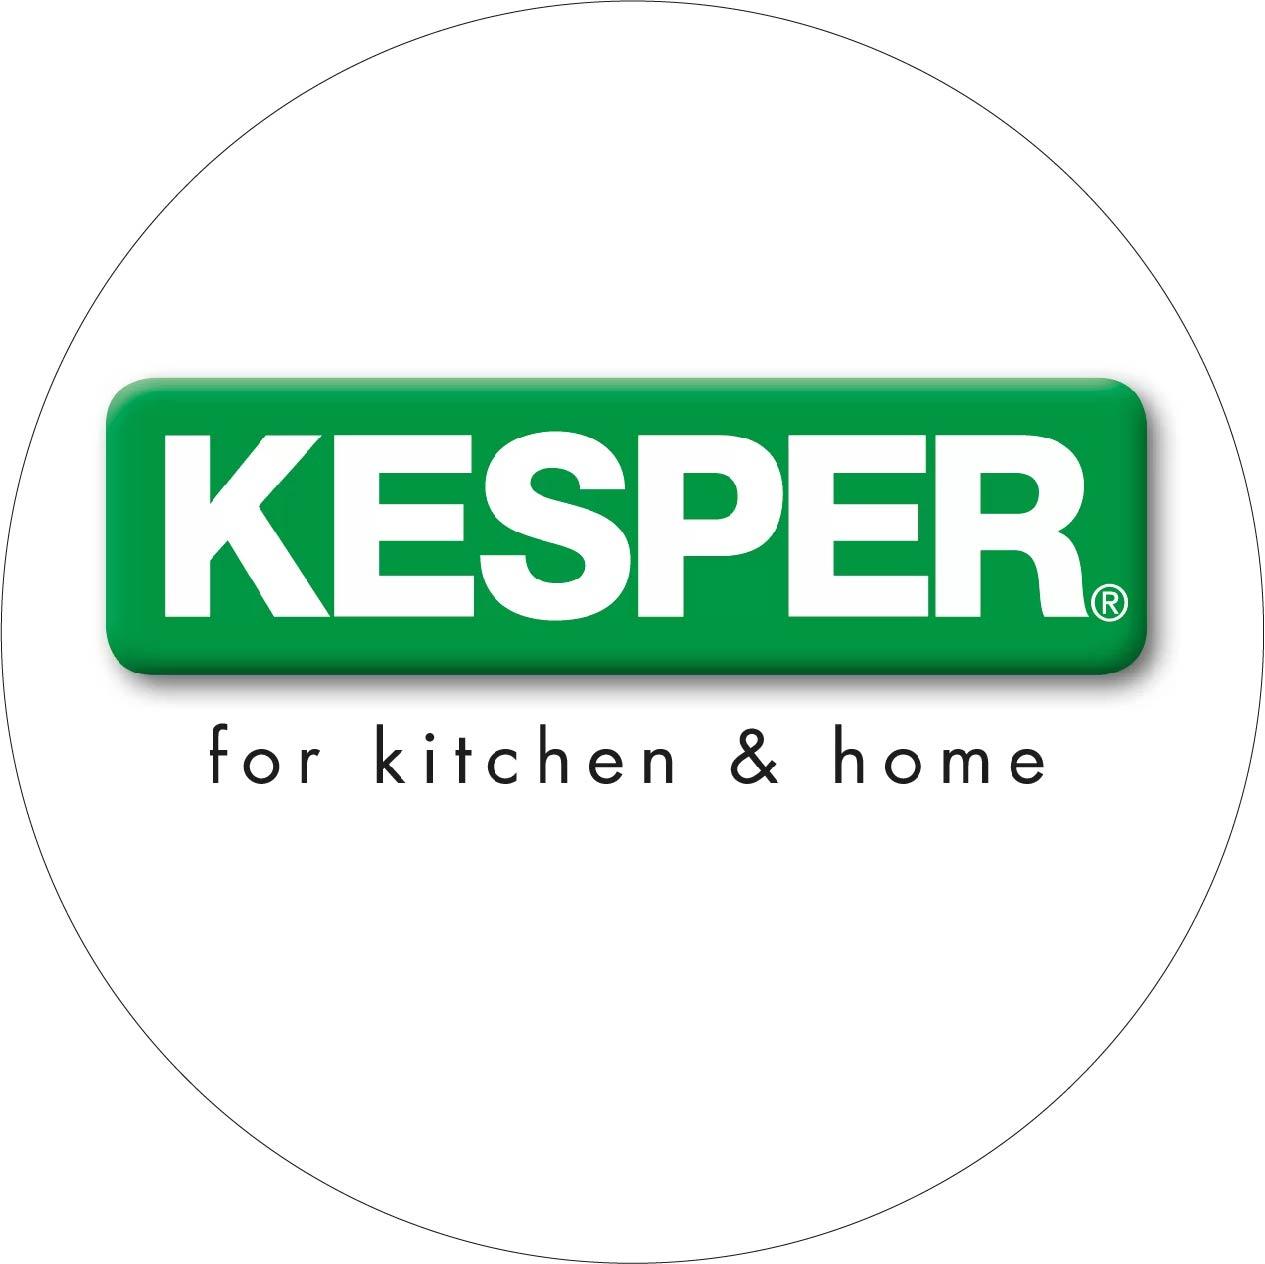 Andrea von Kesper